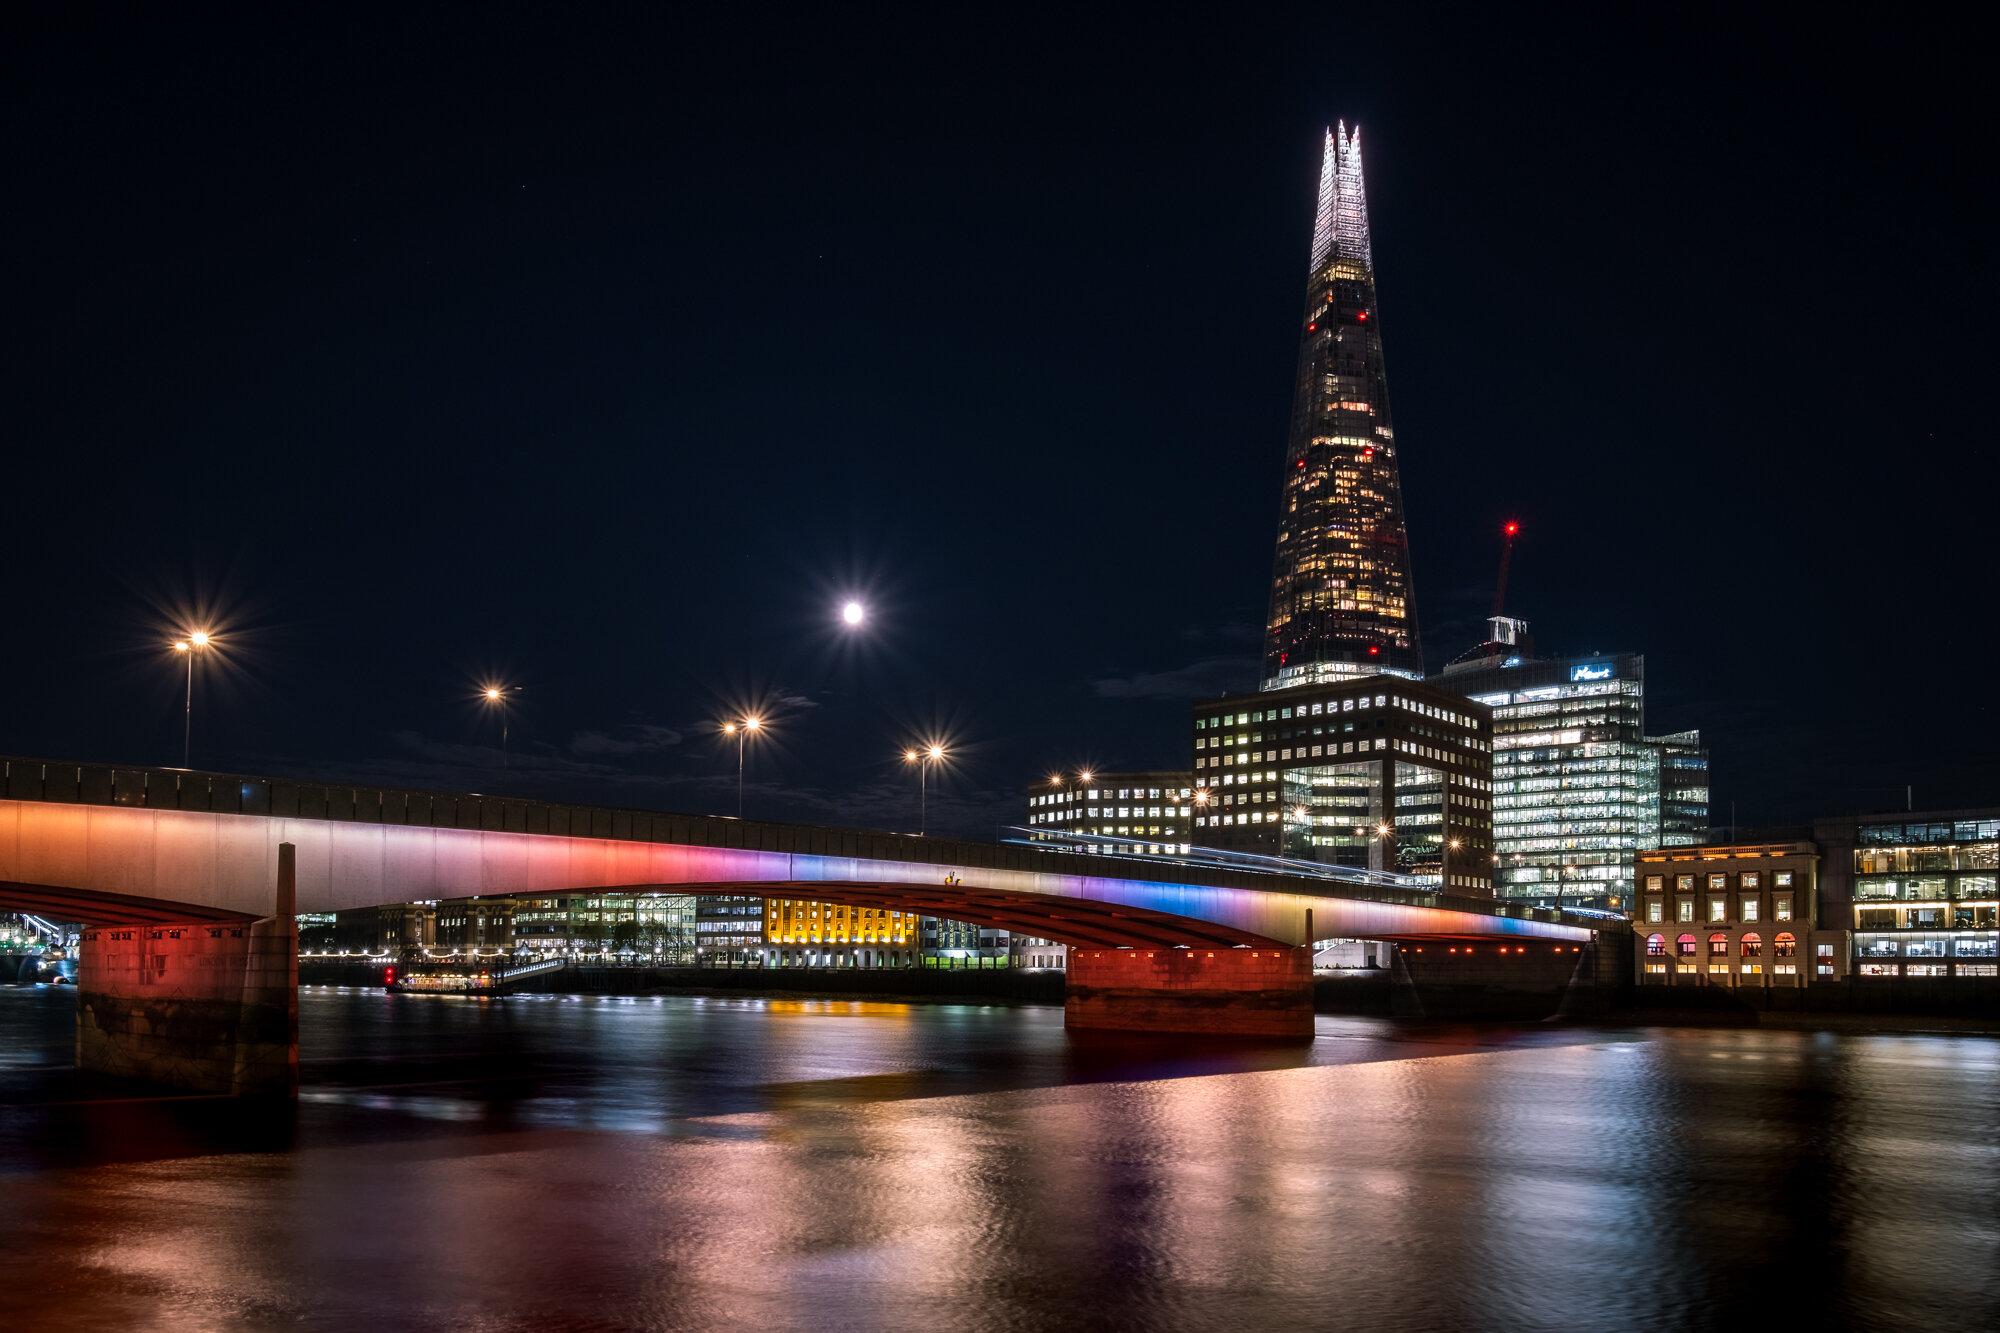 Illuminated River | Fujifilm XT2 | XF10-24mm | 15mm | 6 Seconds | f/10 | ISO200